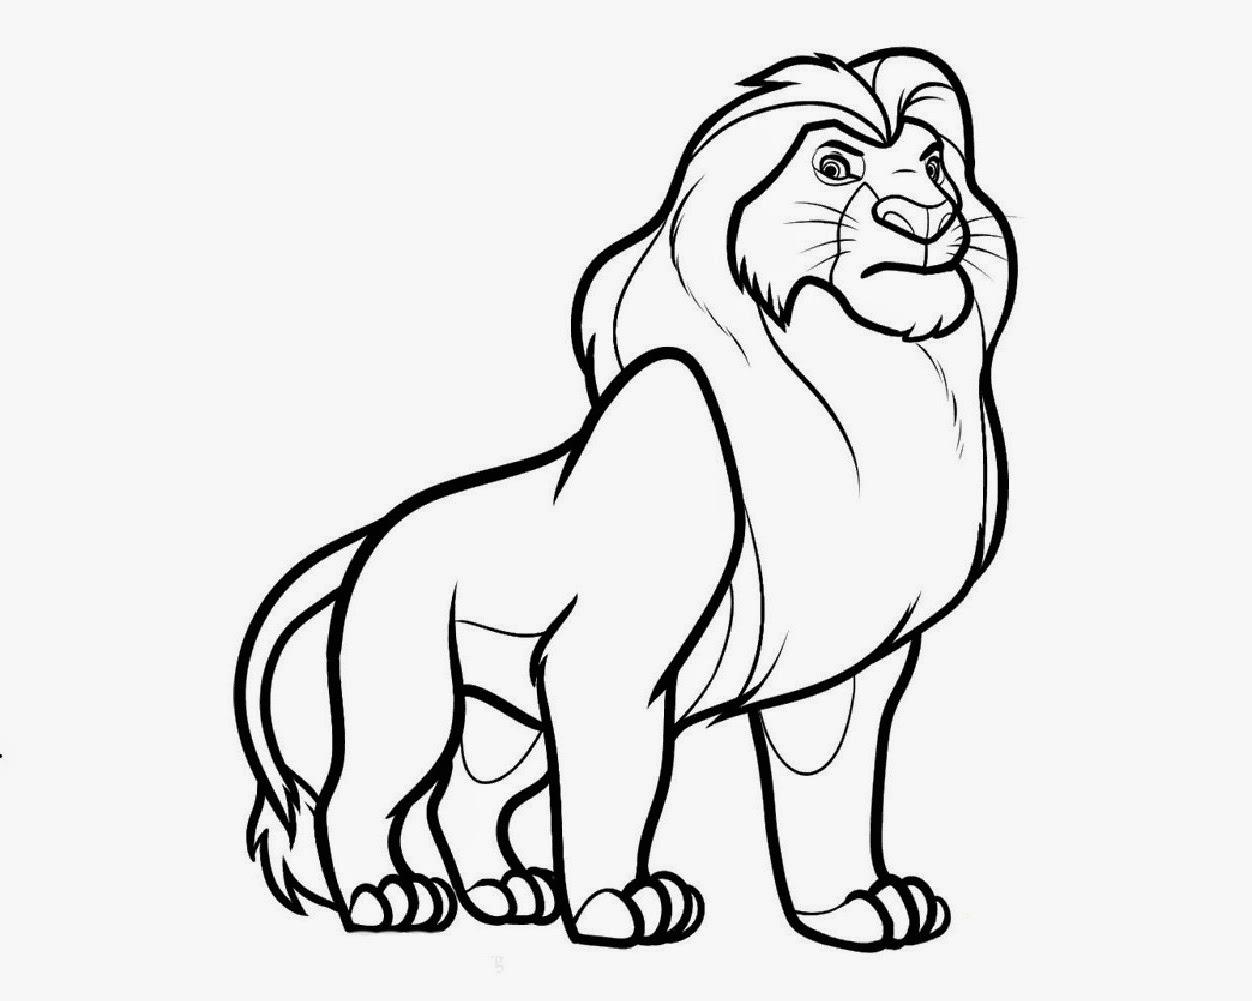 1252x1001 Colour Drawing Free Wallpaper Disney Cartoon The Lion King